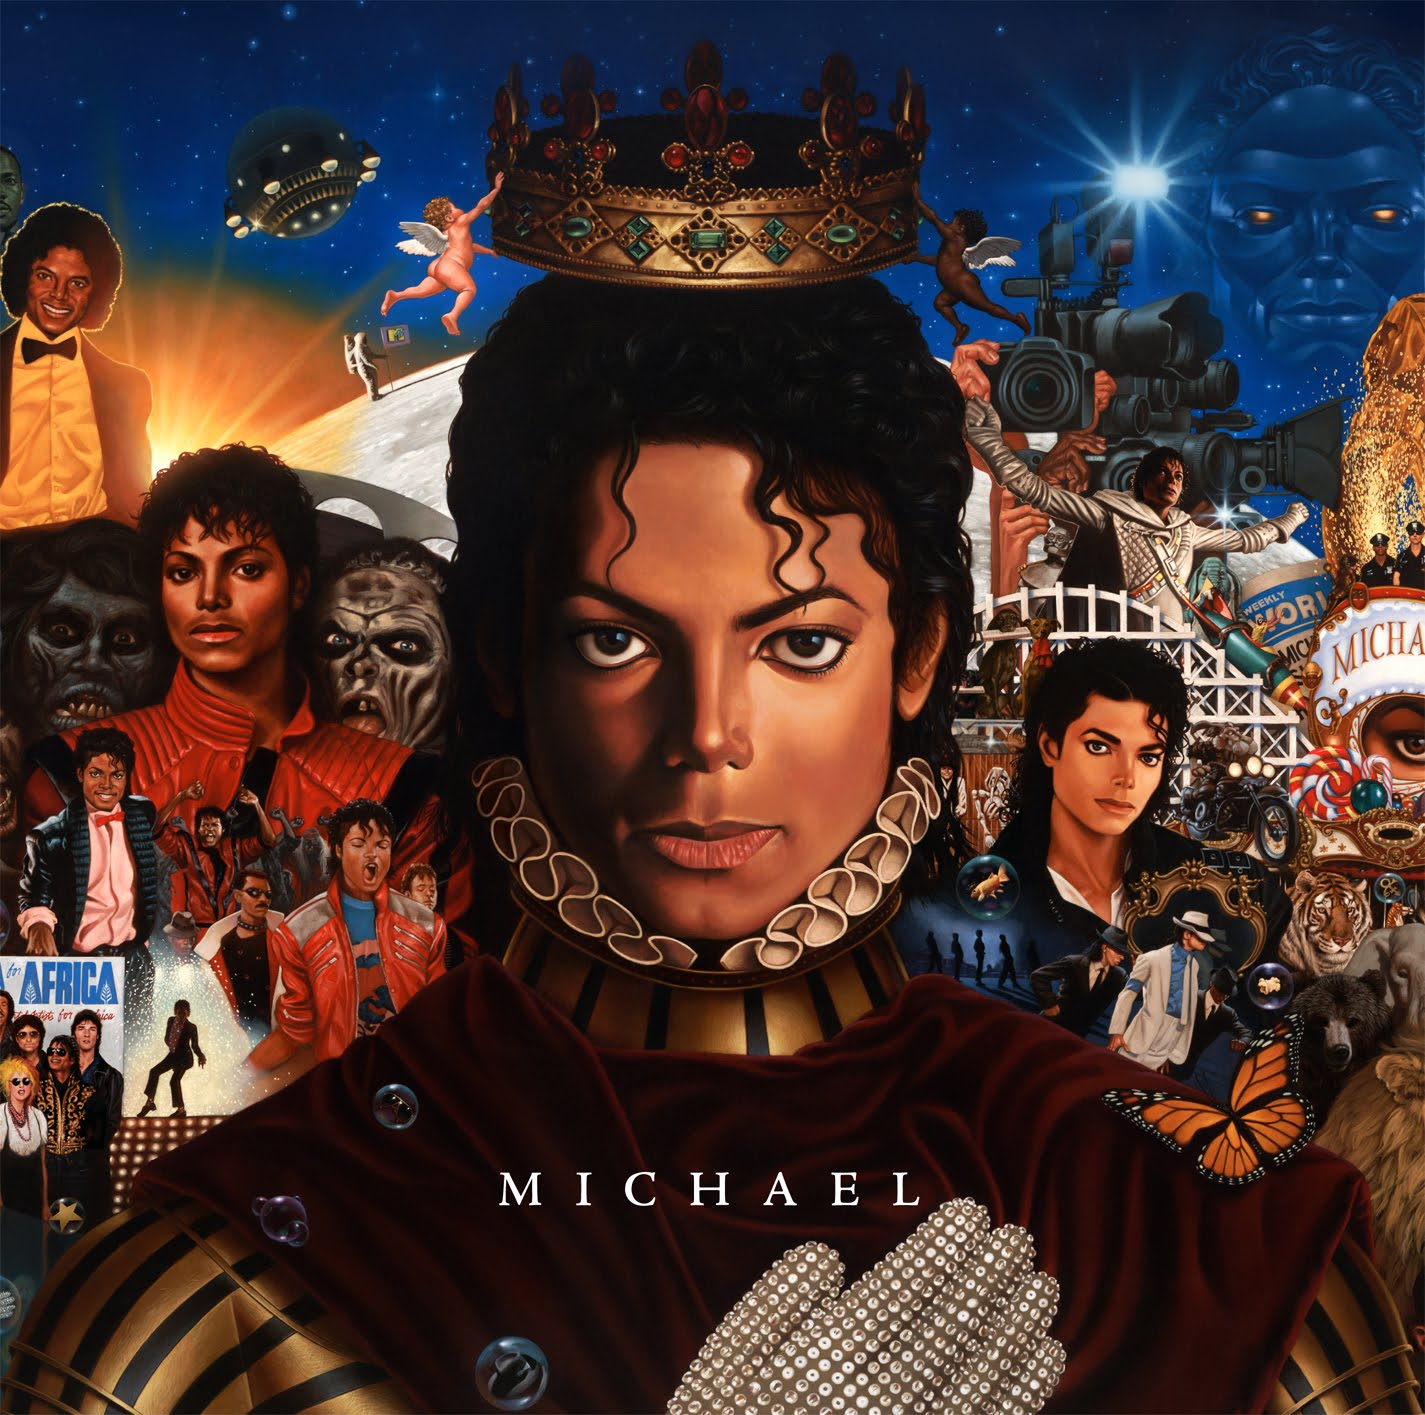 michael jackson album cover - photo #1